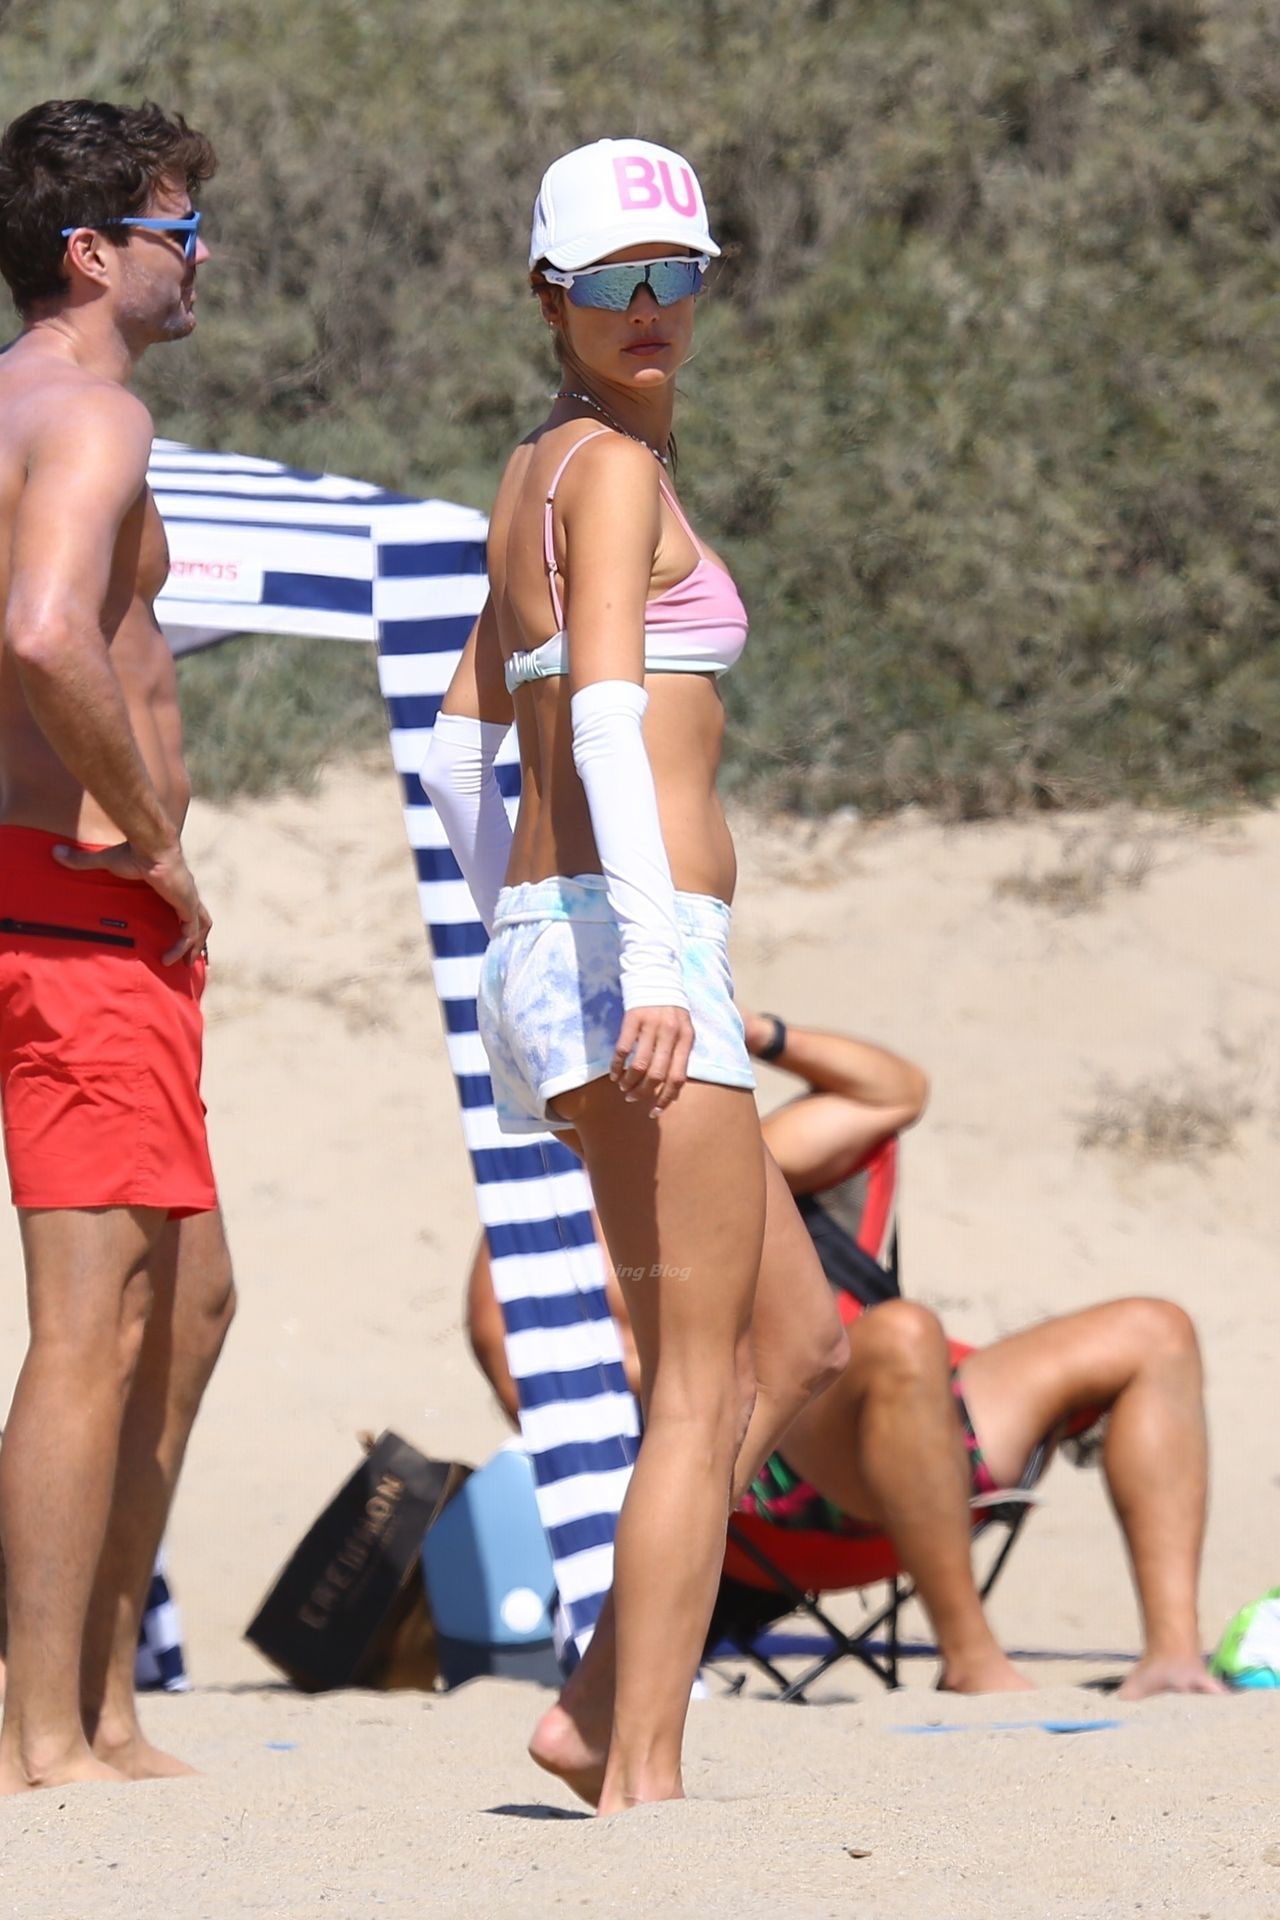 Alessandra-Ambrosio-Sexy-The-Fappening-Blog-16-1.jpg